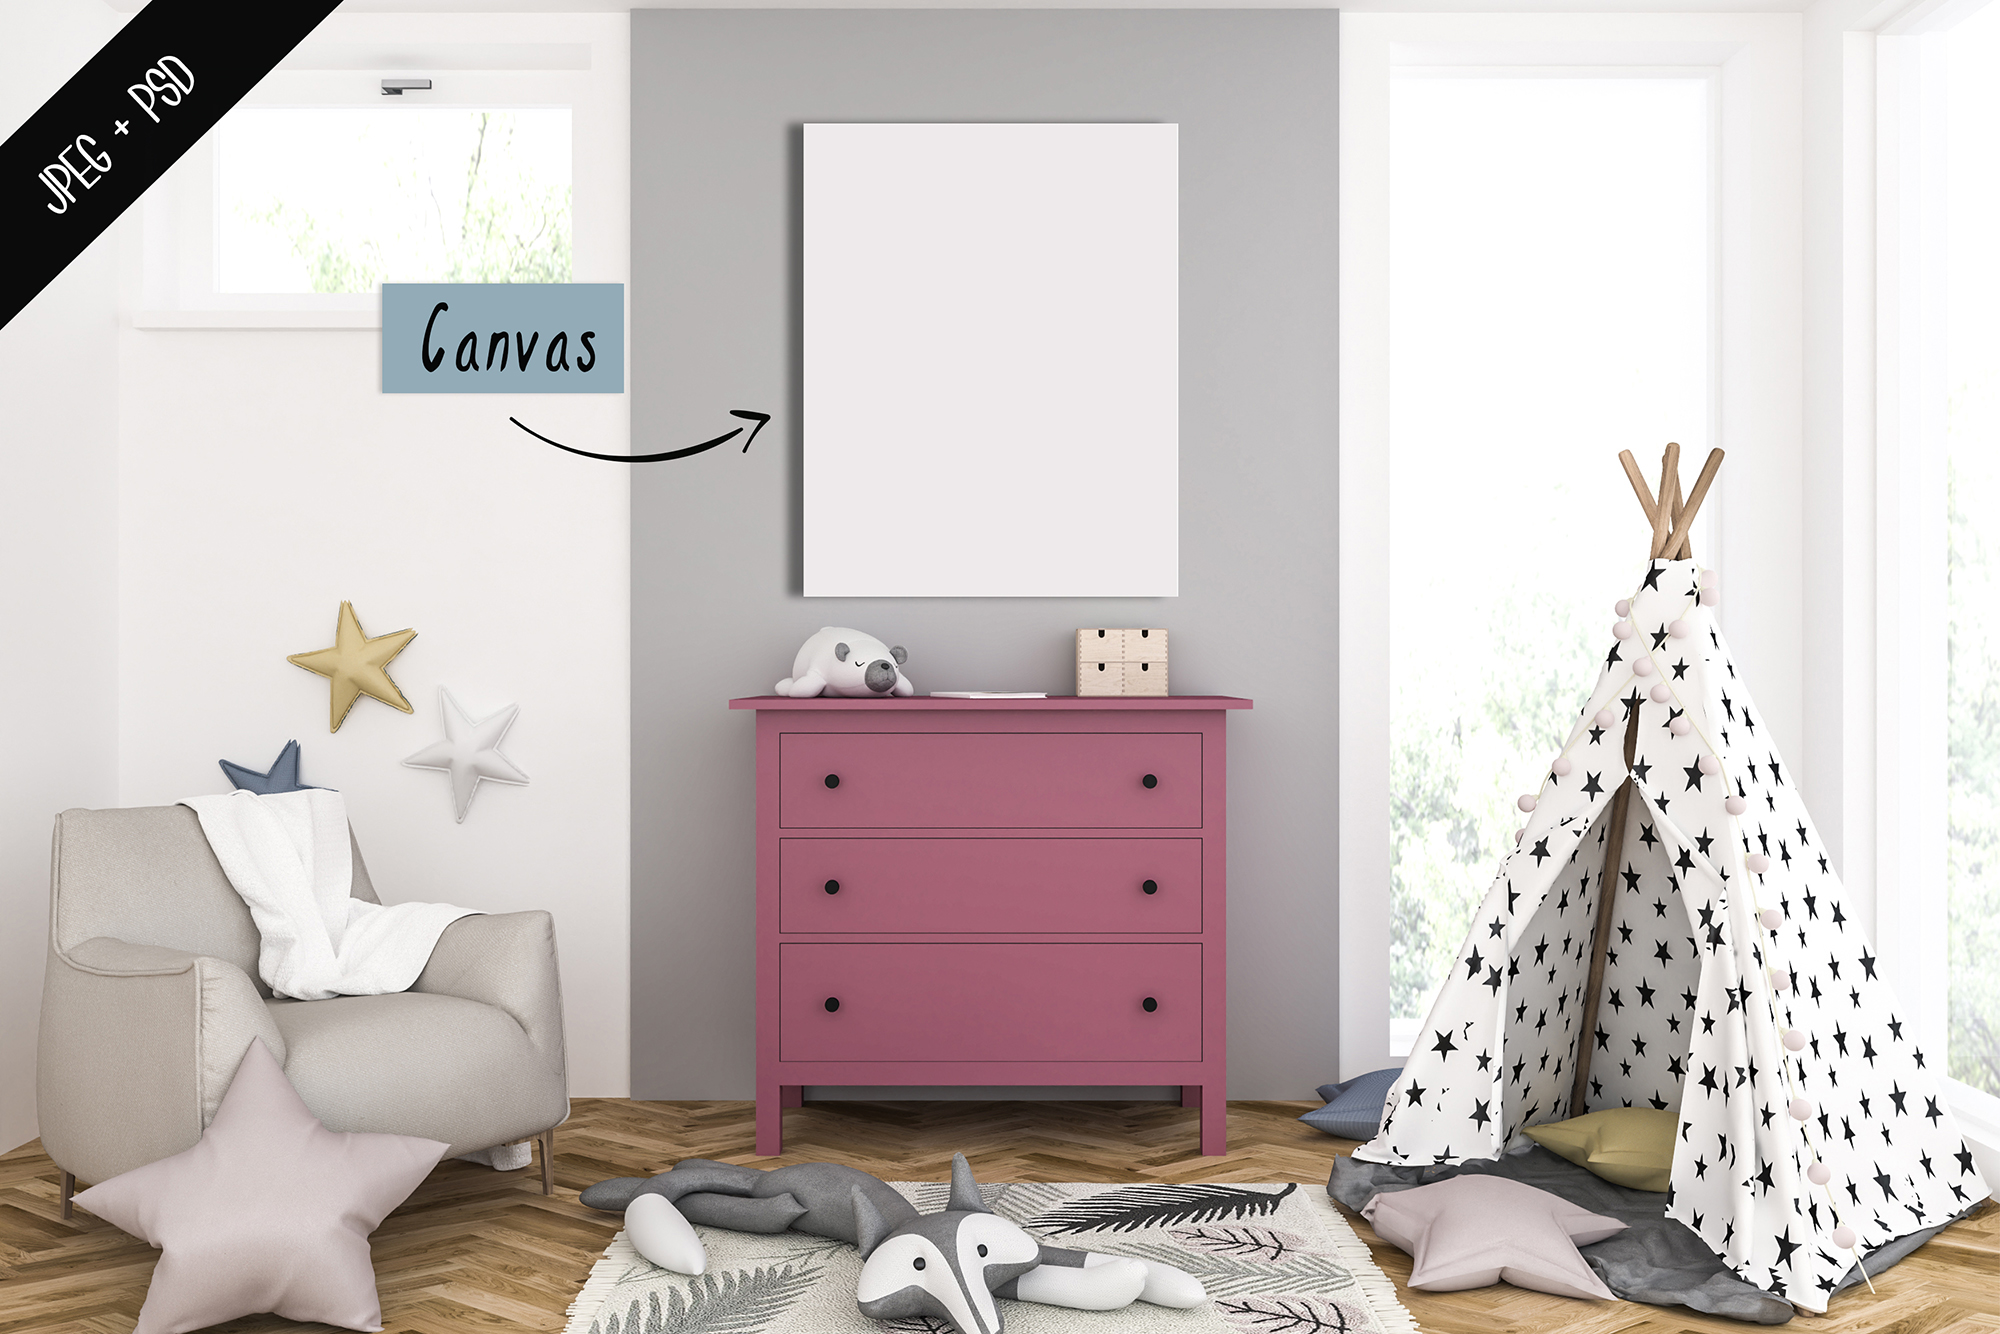 Frame mockup creator - All image size - Interior mockup example image 7